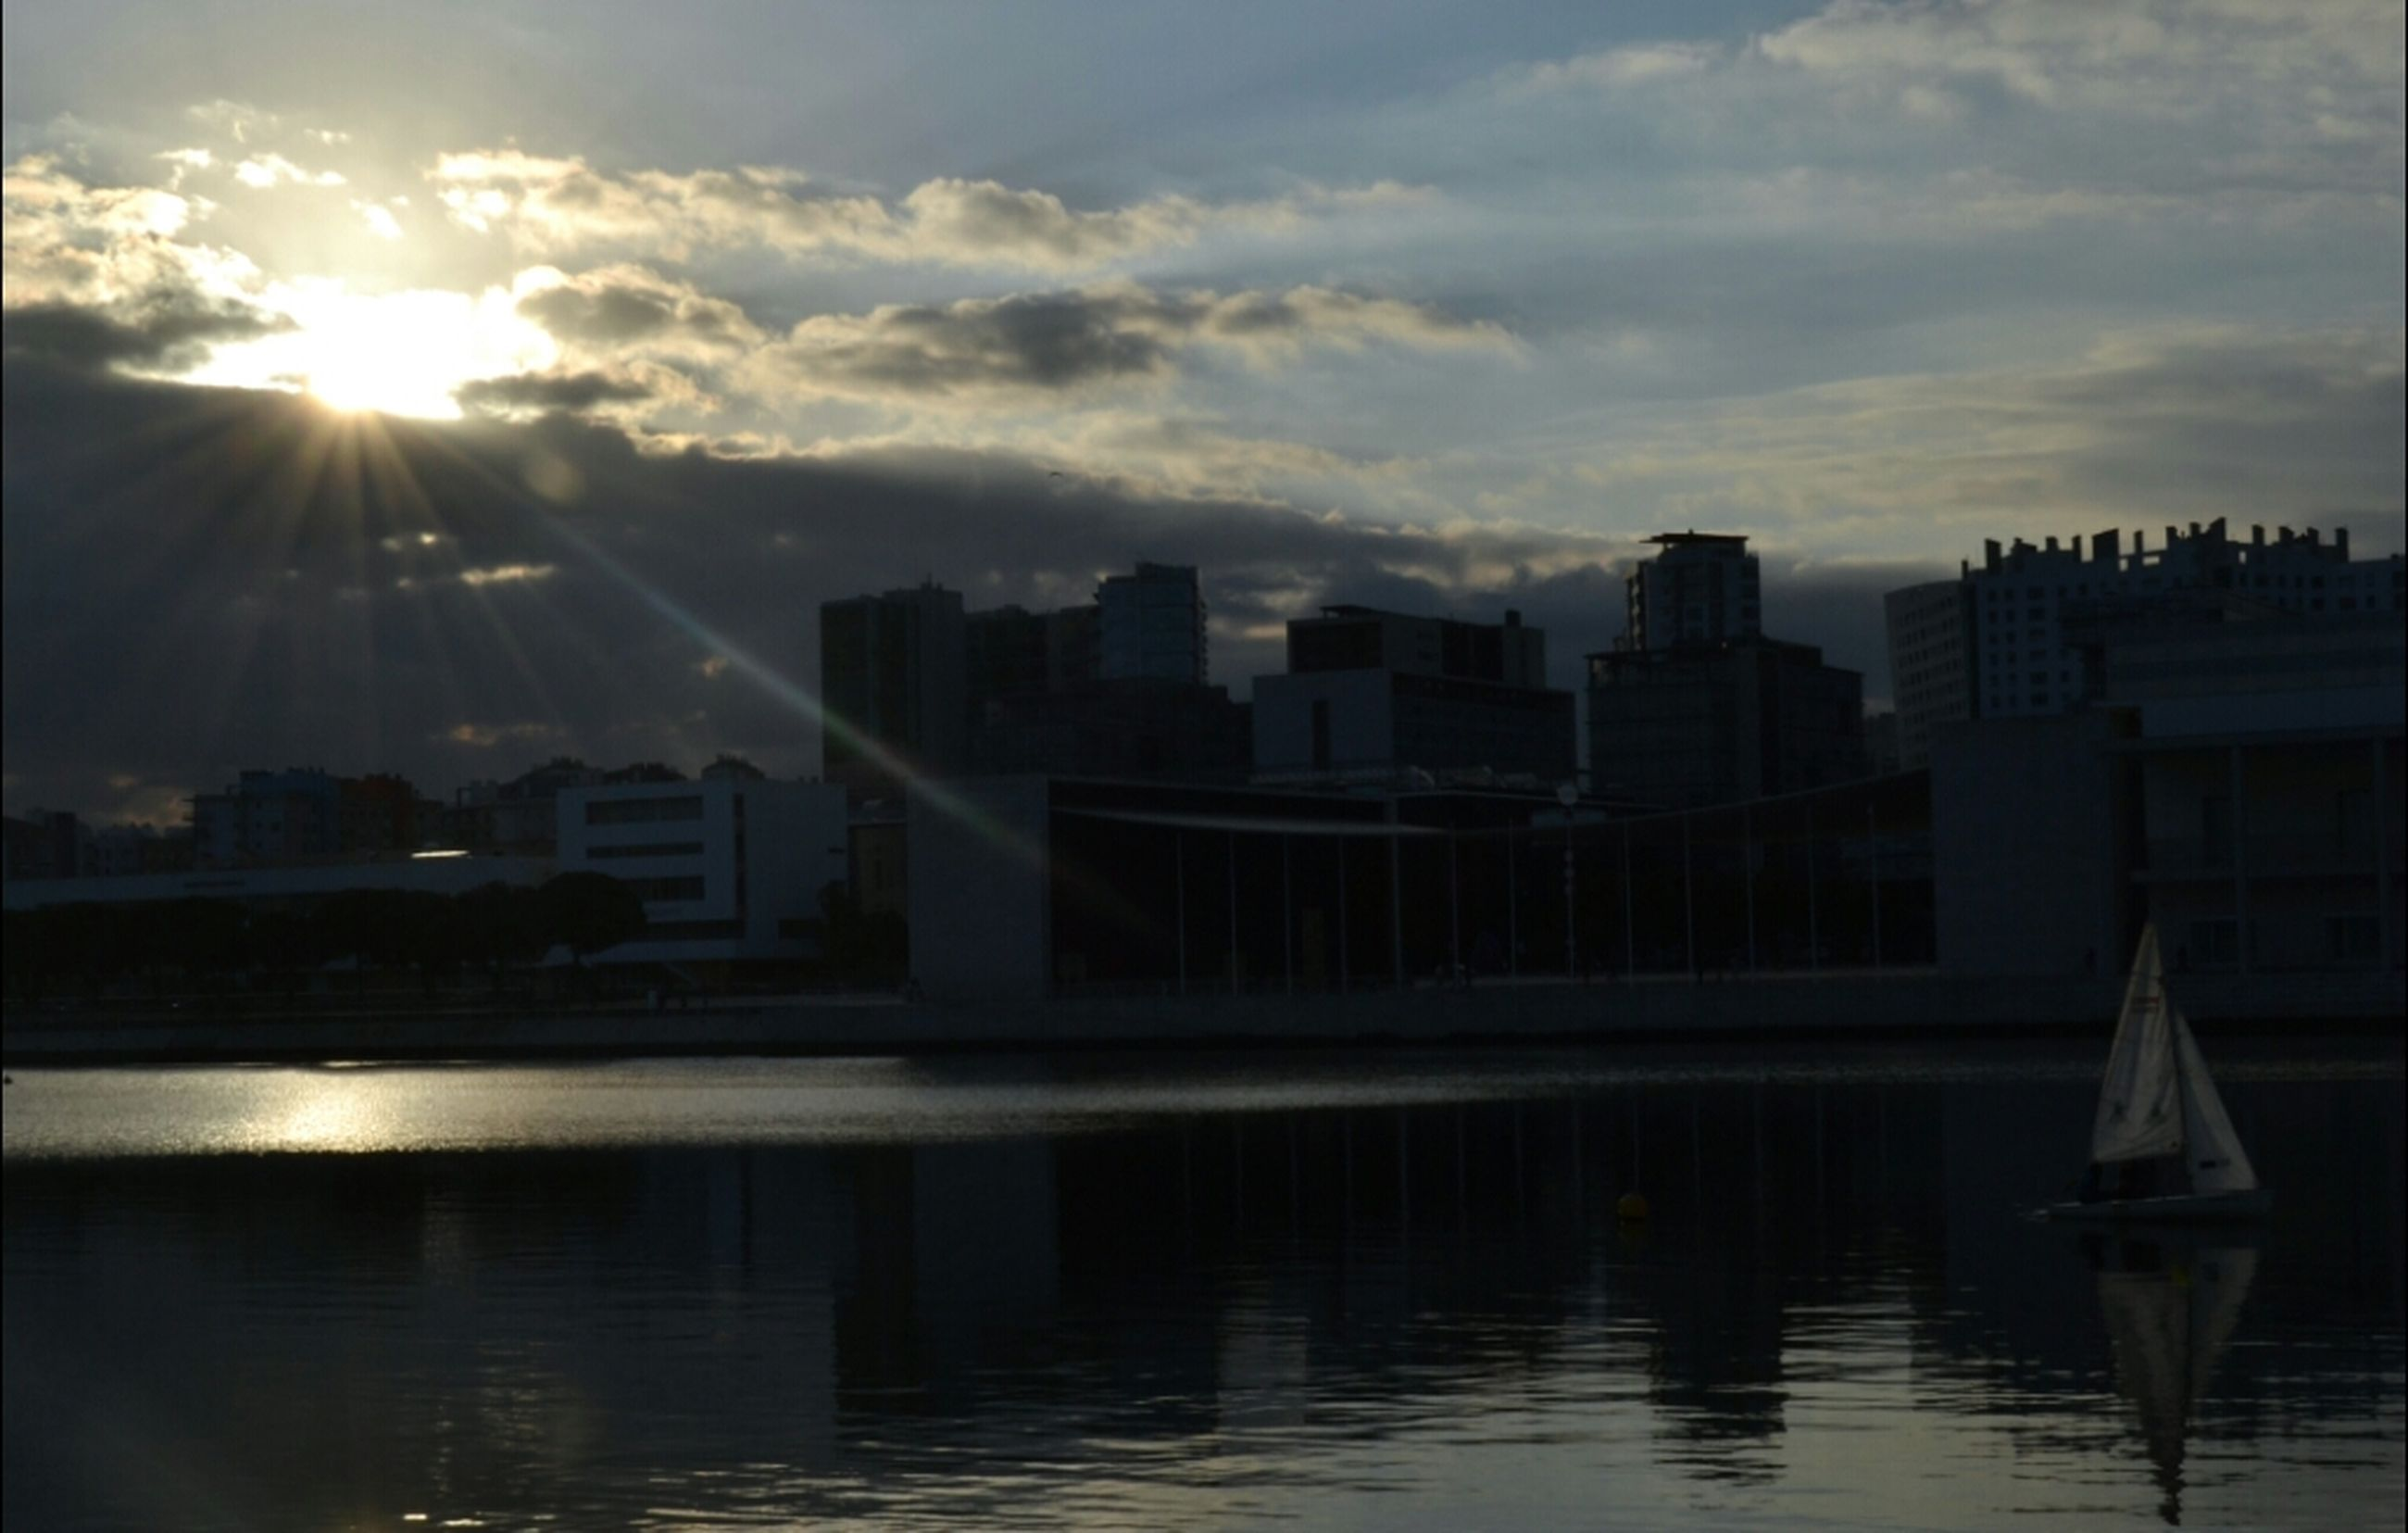 architecture, building exterior, water, built structure, sun, sunbeam, sky, city, reflection, sunlight, waterfront, lens flare, river, sunset, cloud - sky, skyscraper, cloud, cityscape, outdoors, no people